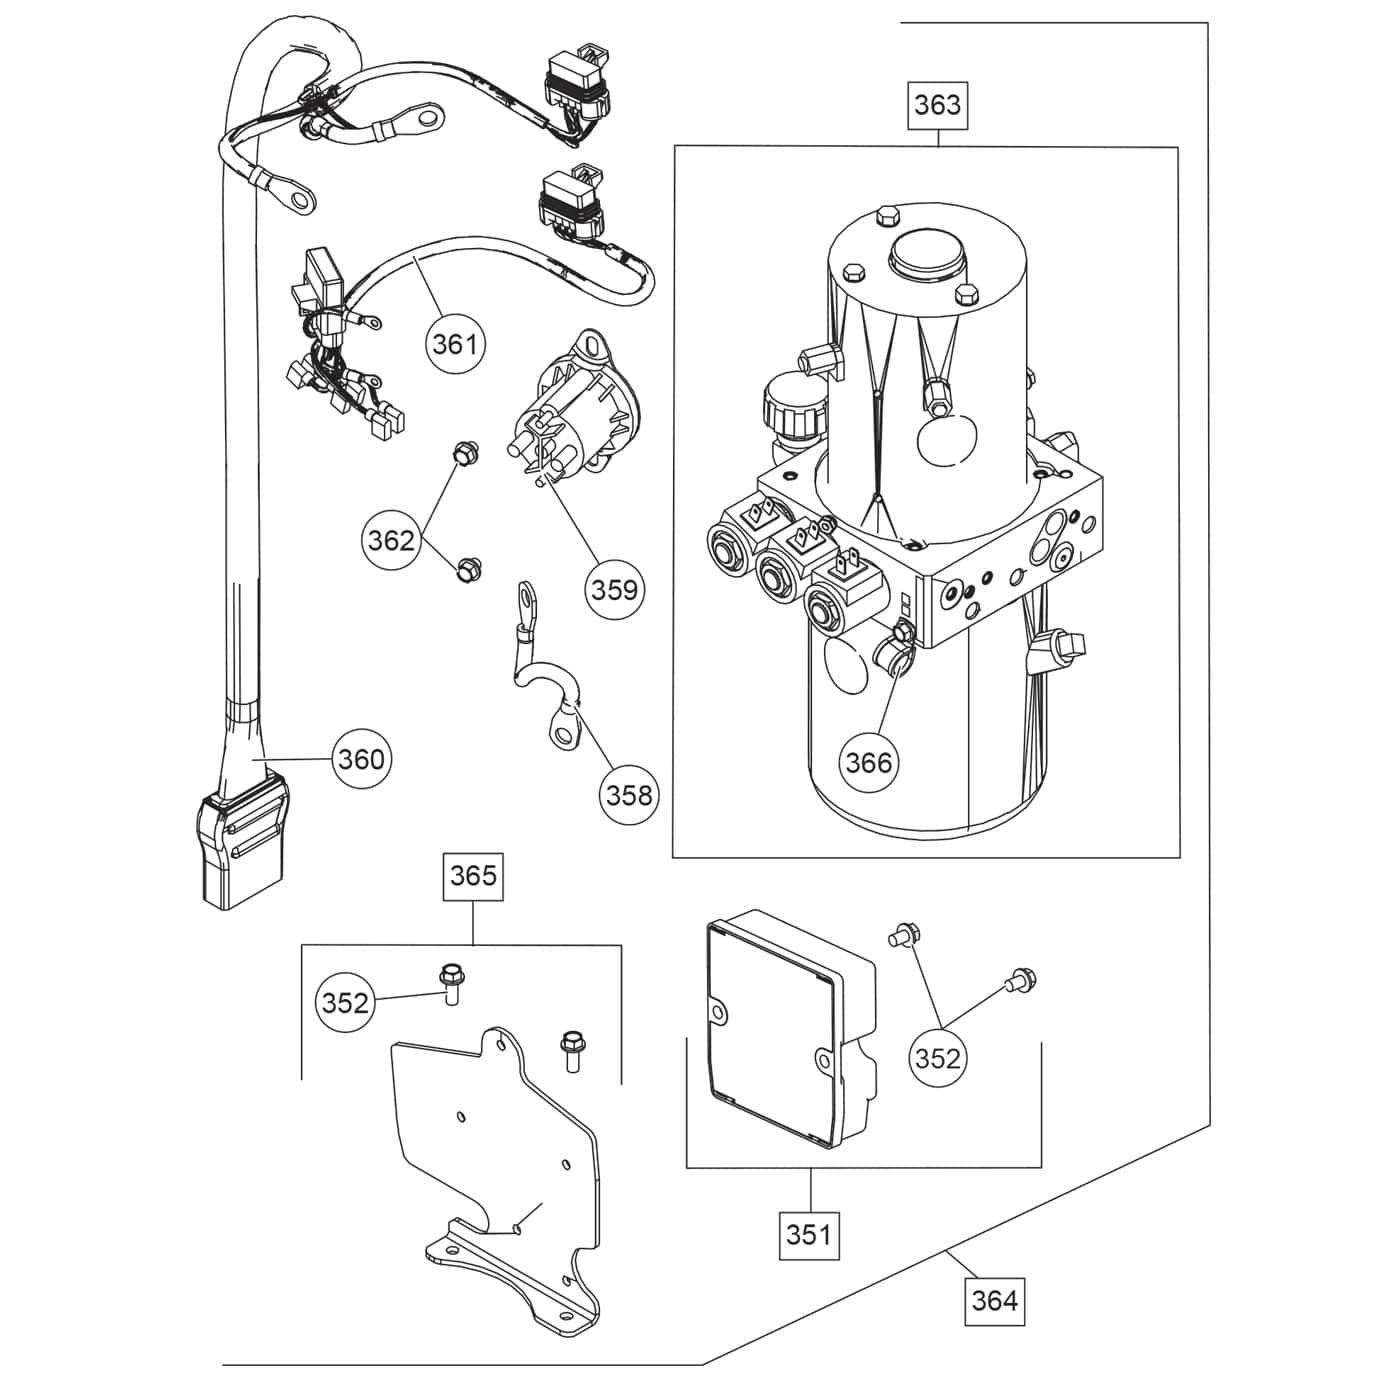 Fisher Xblade Parts Diagram